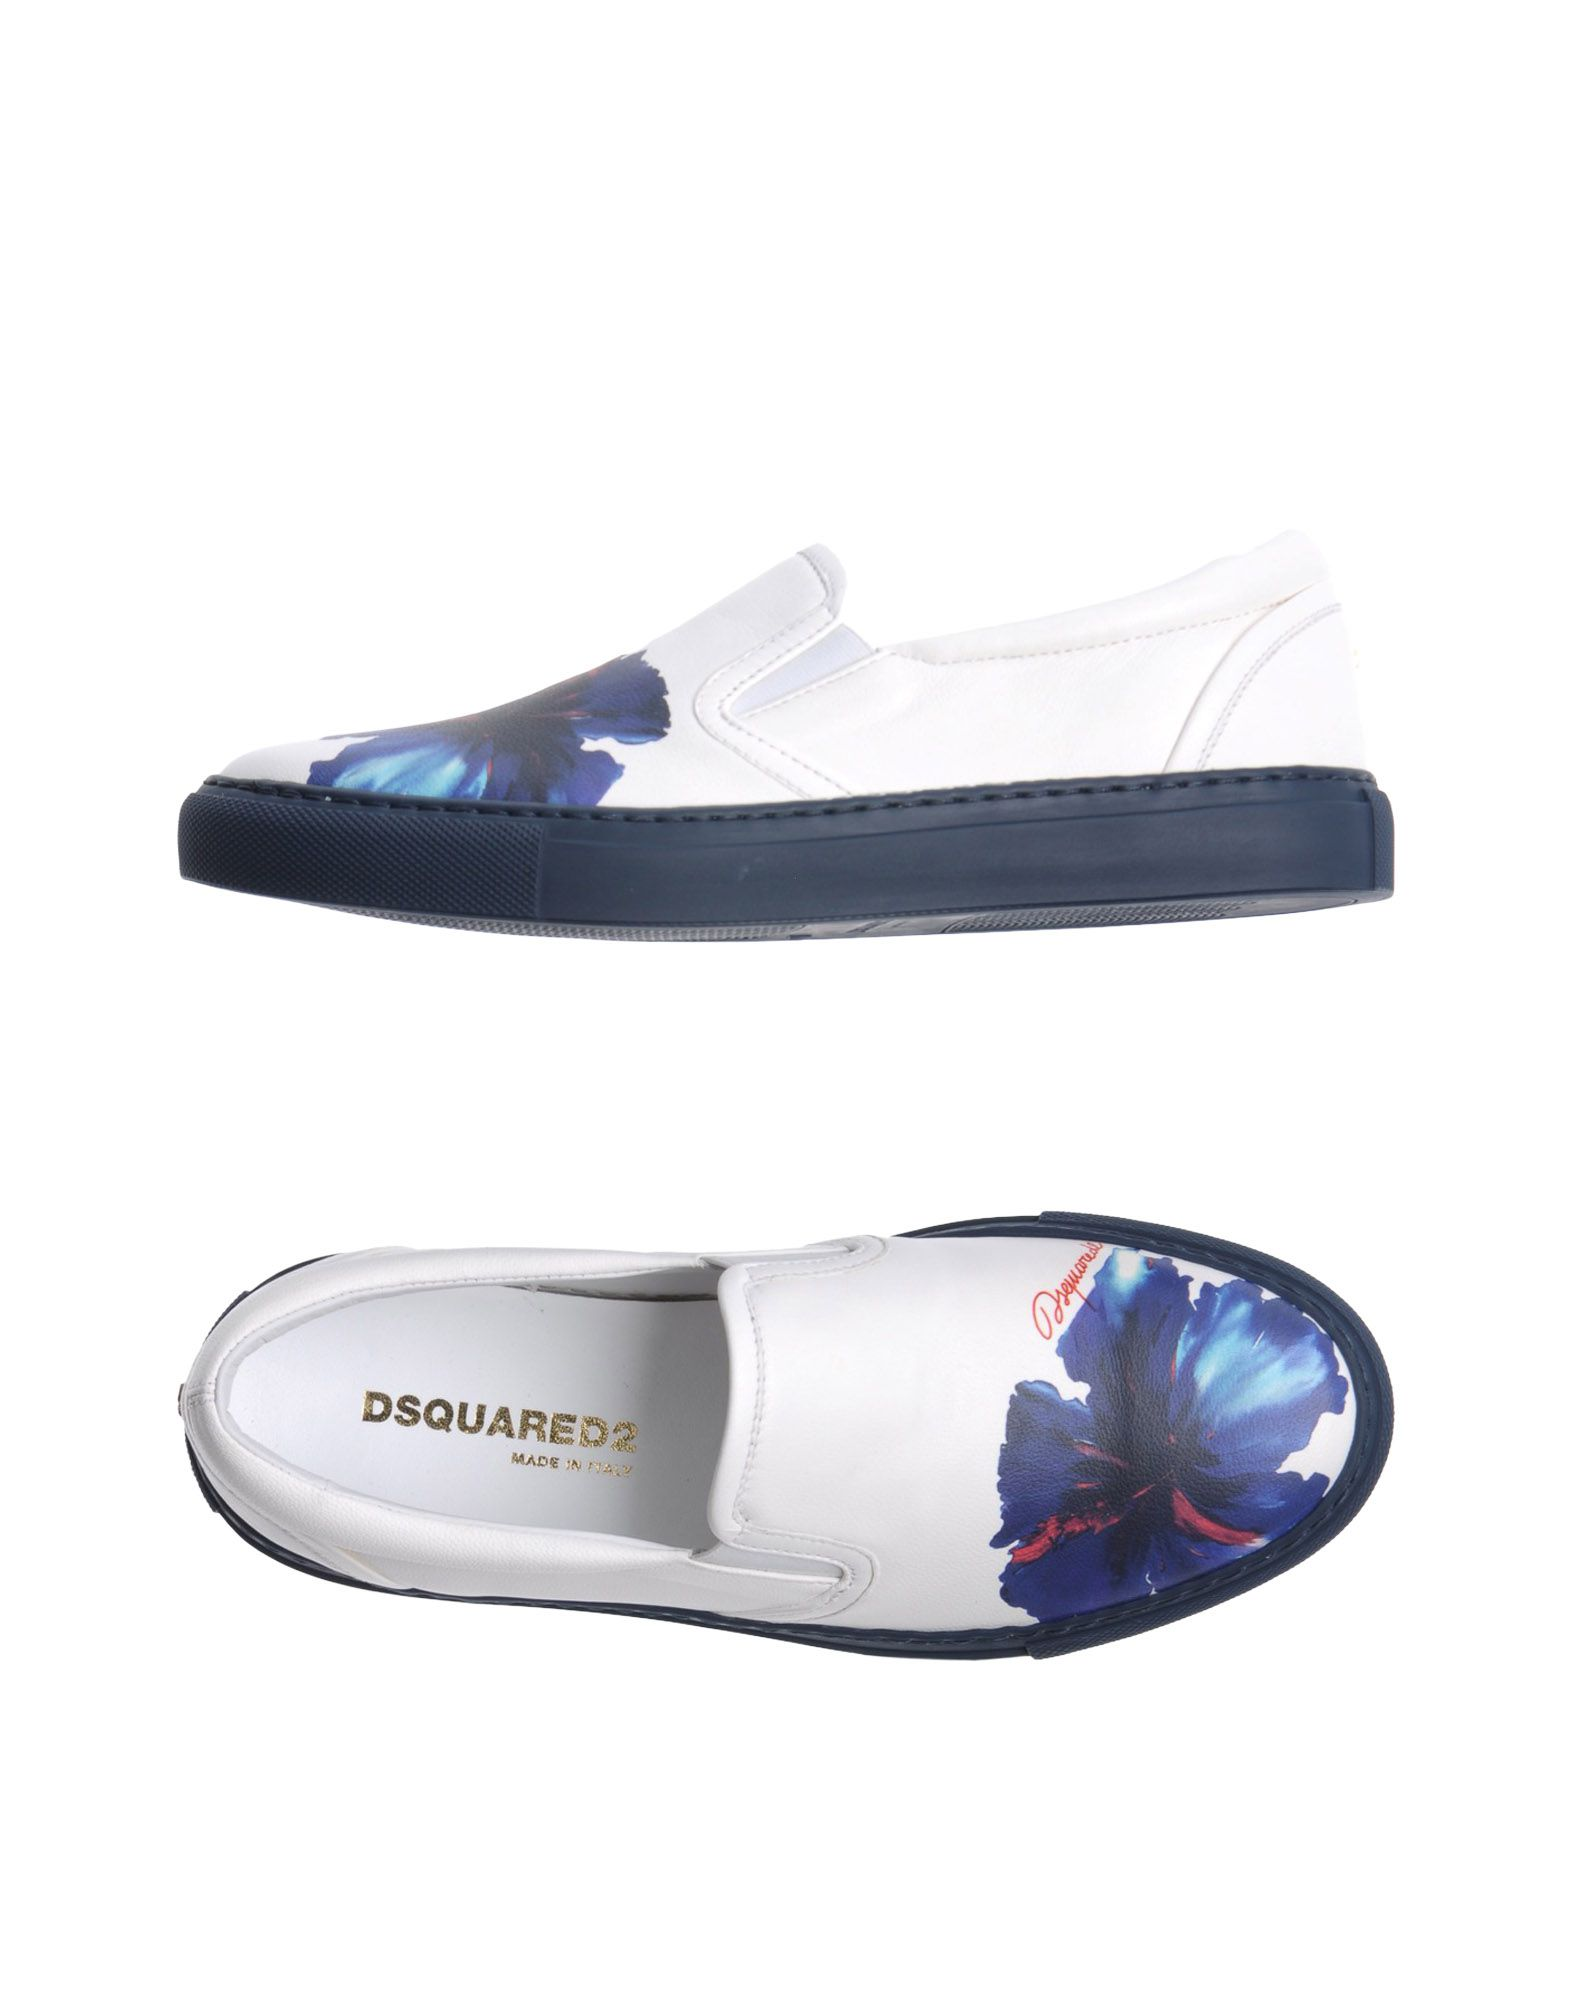 Rabatt Schuhe DsquaROT2 Sneakers  Damen  Sneakers 11179660XN 0822d9